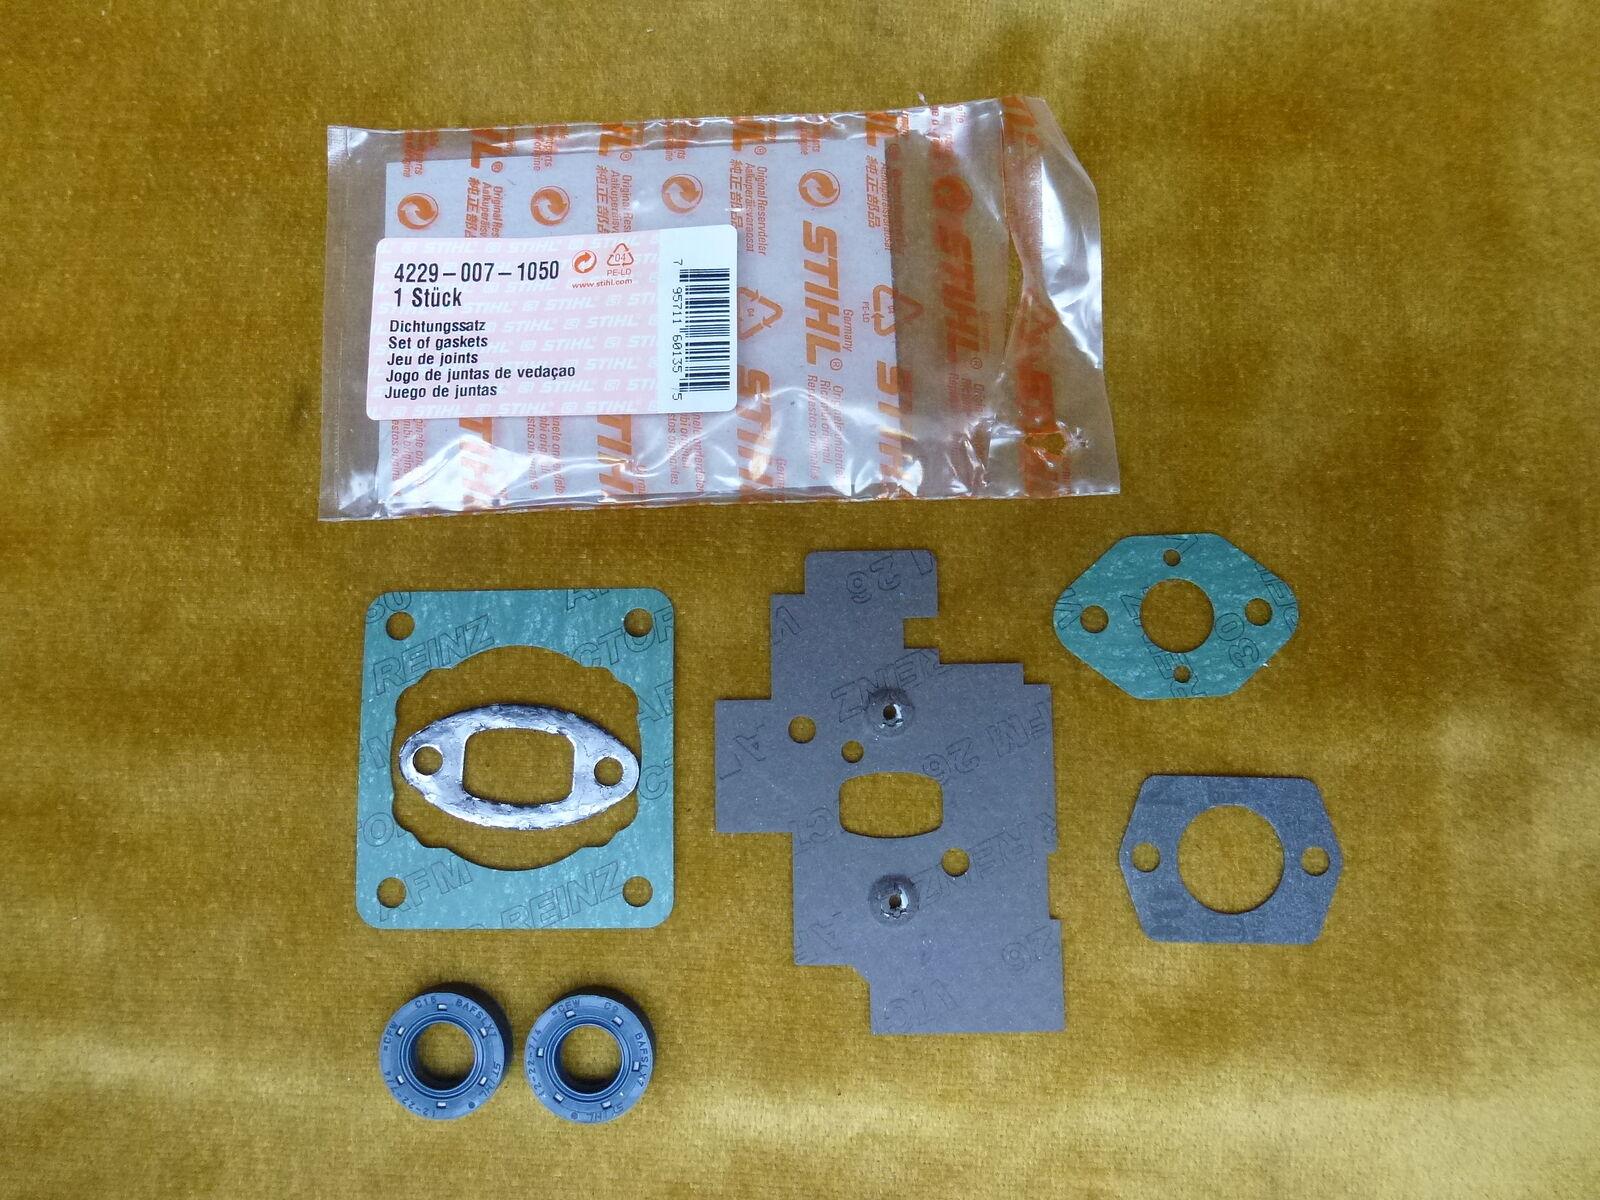 NEU Original Stihl FS 38 45 46 55 FC 55 Stoppschalter Schalter 4229 430 0203